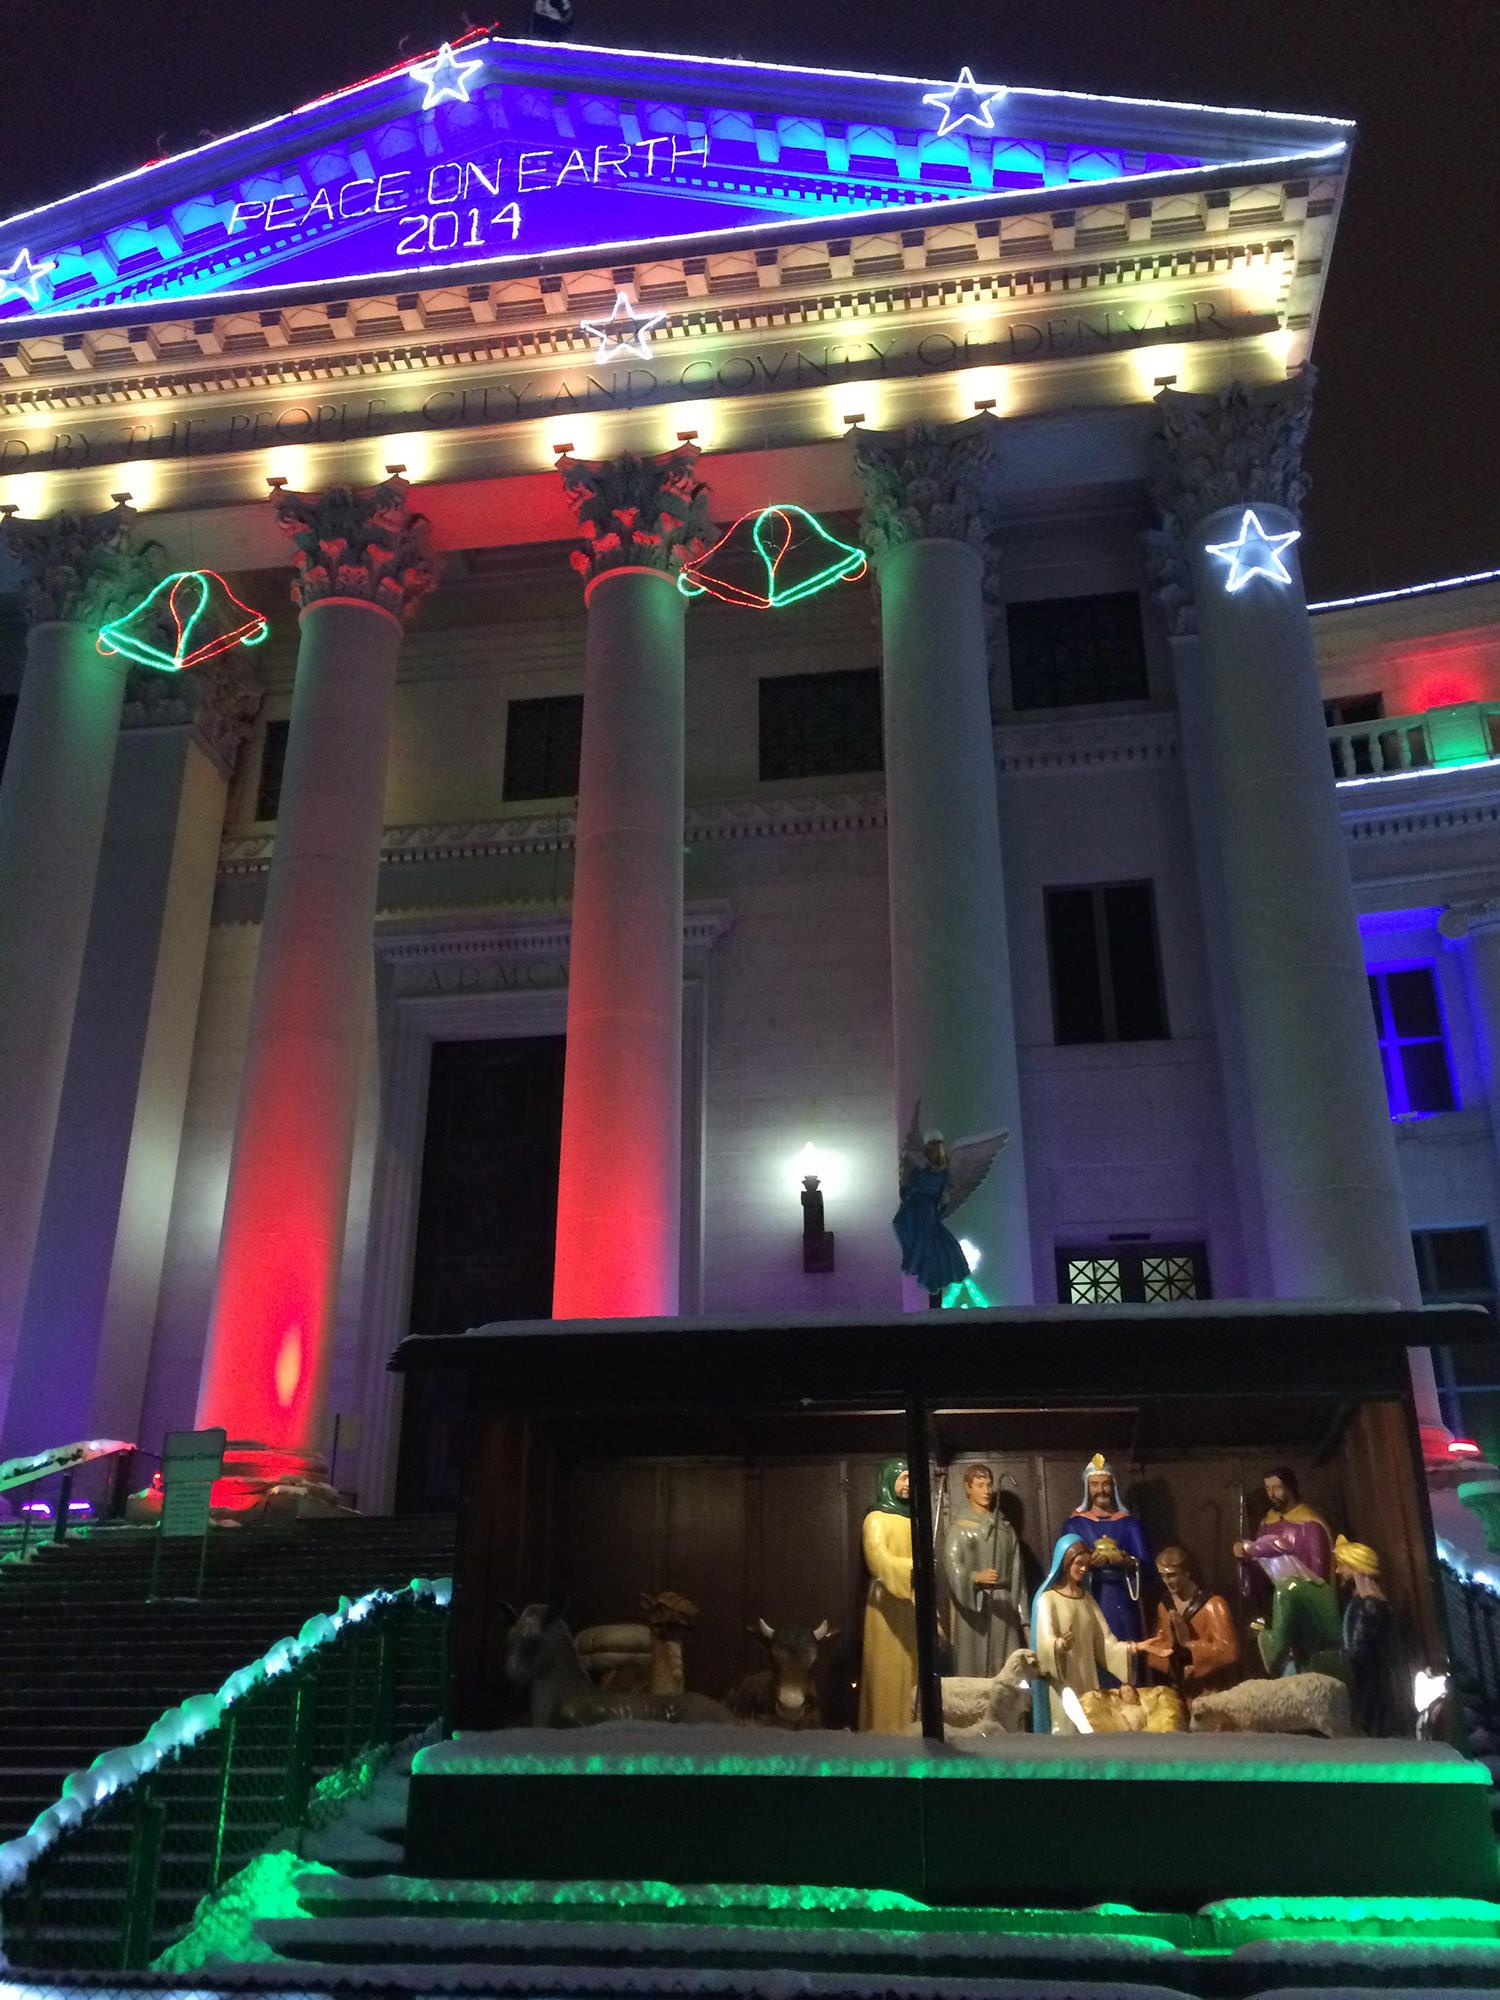 Fig. 31 Christmas Display, Denver City and County Building, Denver, Colorado, December 2014. Photo: ©Margaret Olin